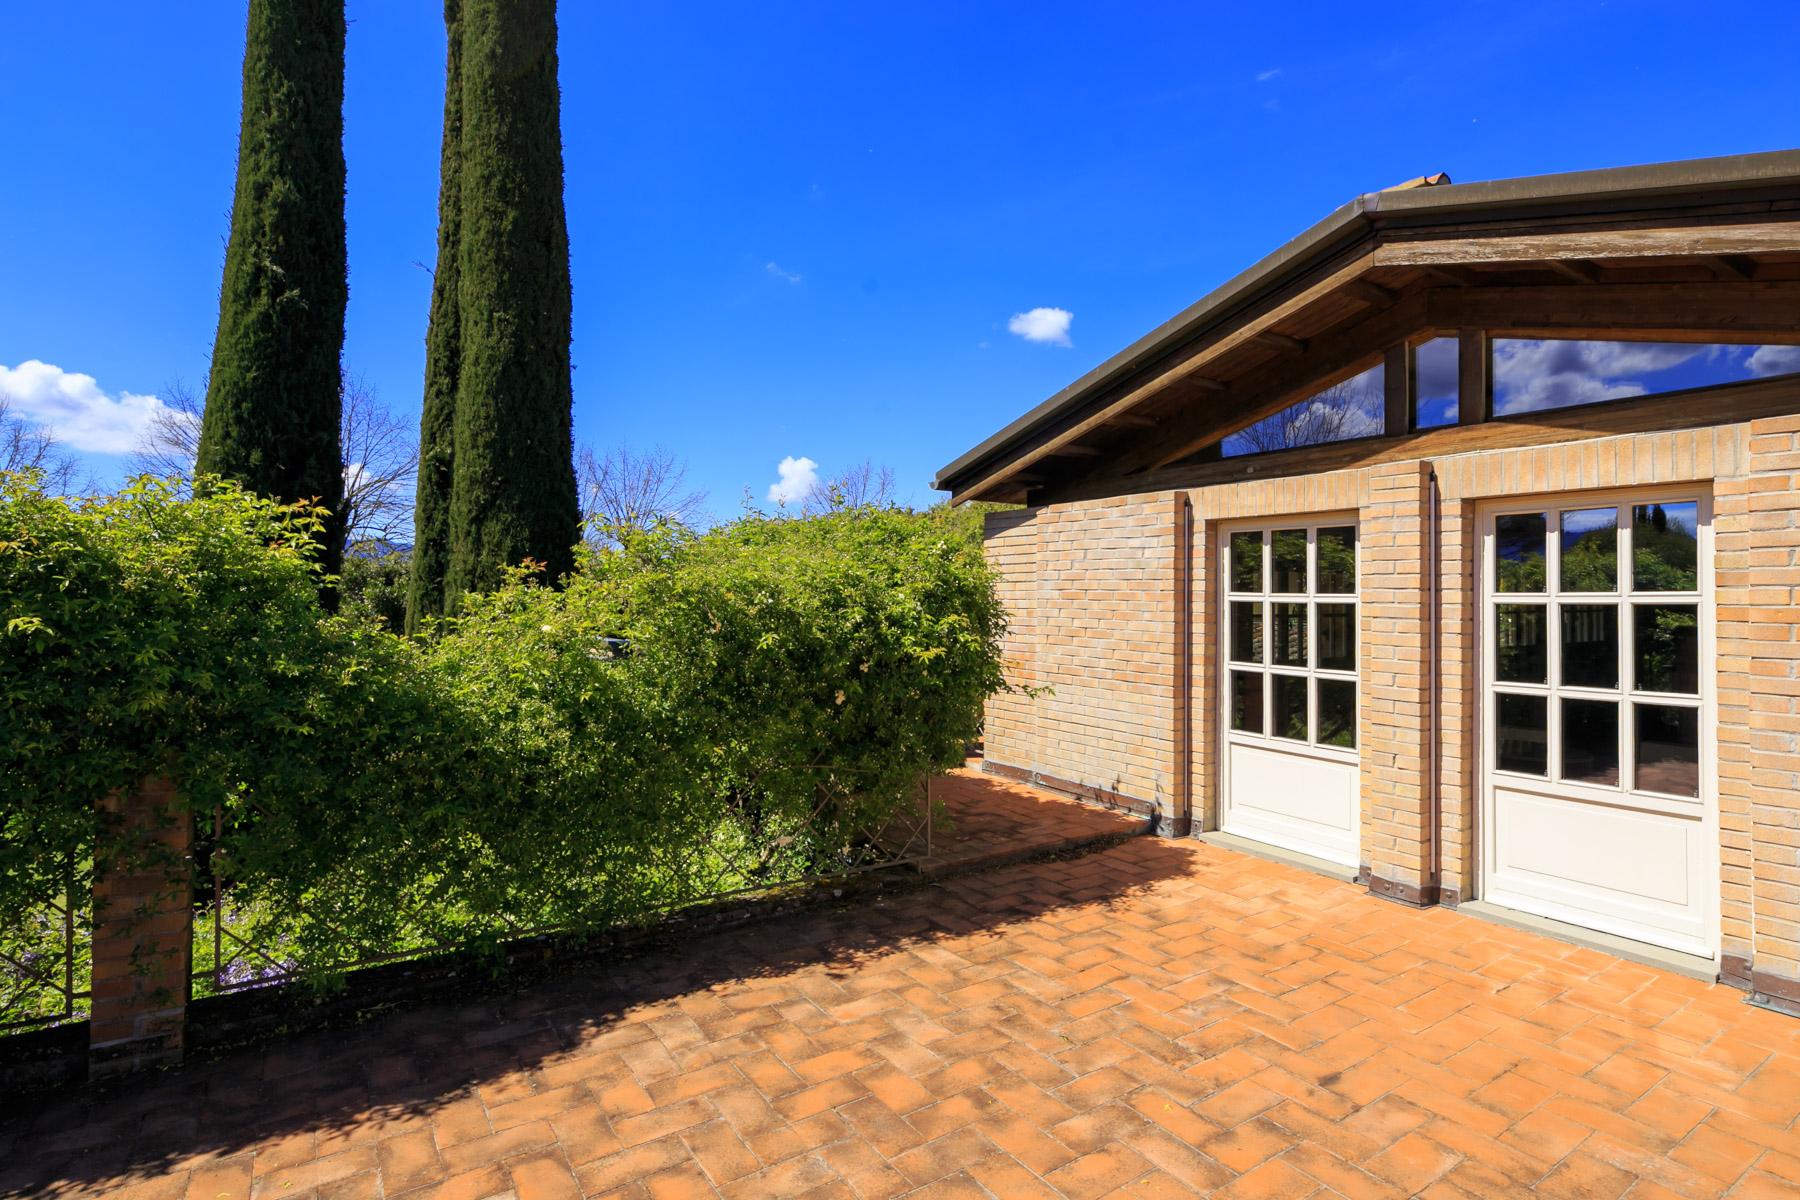 Villa in Vendita a Lucca: 5 locali, 500 mq - Foto 16